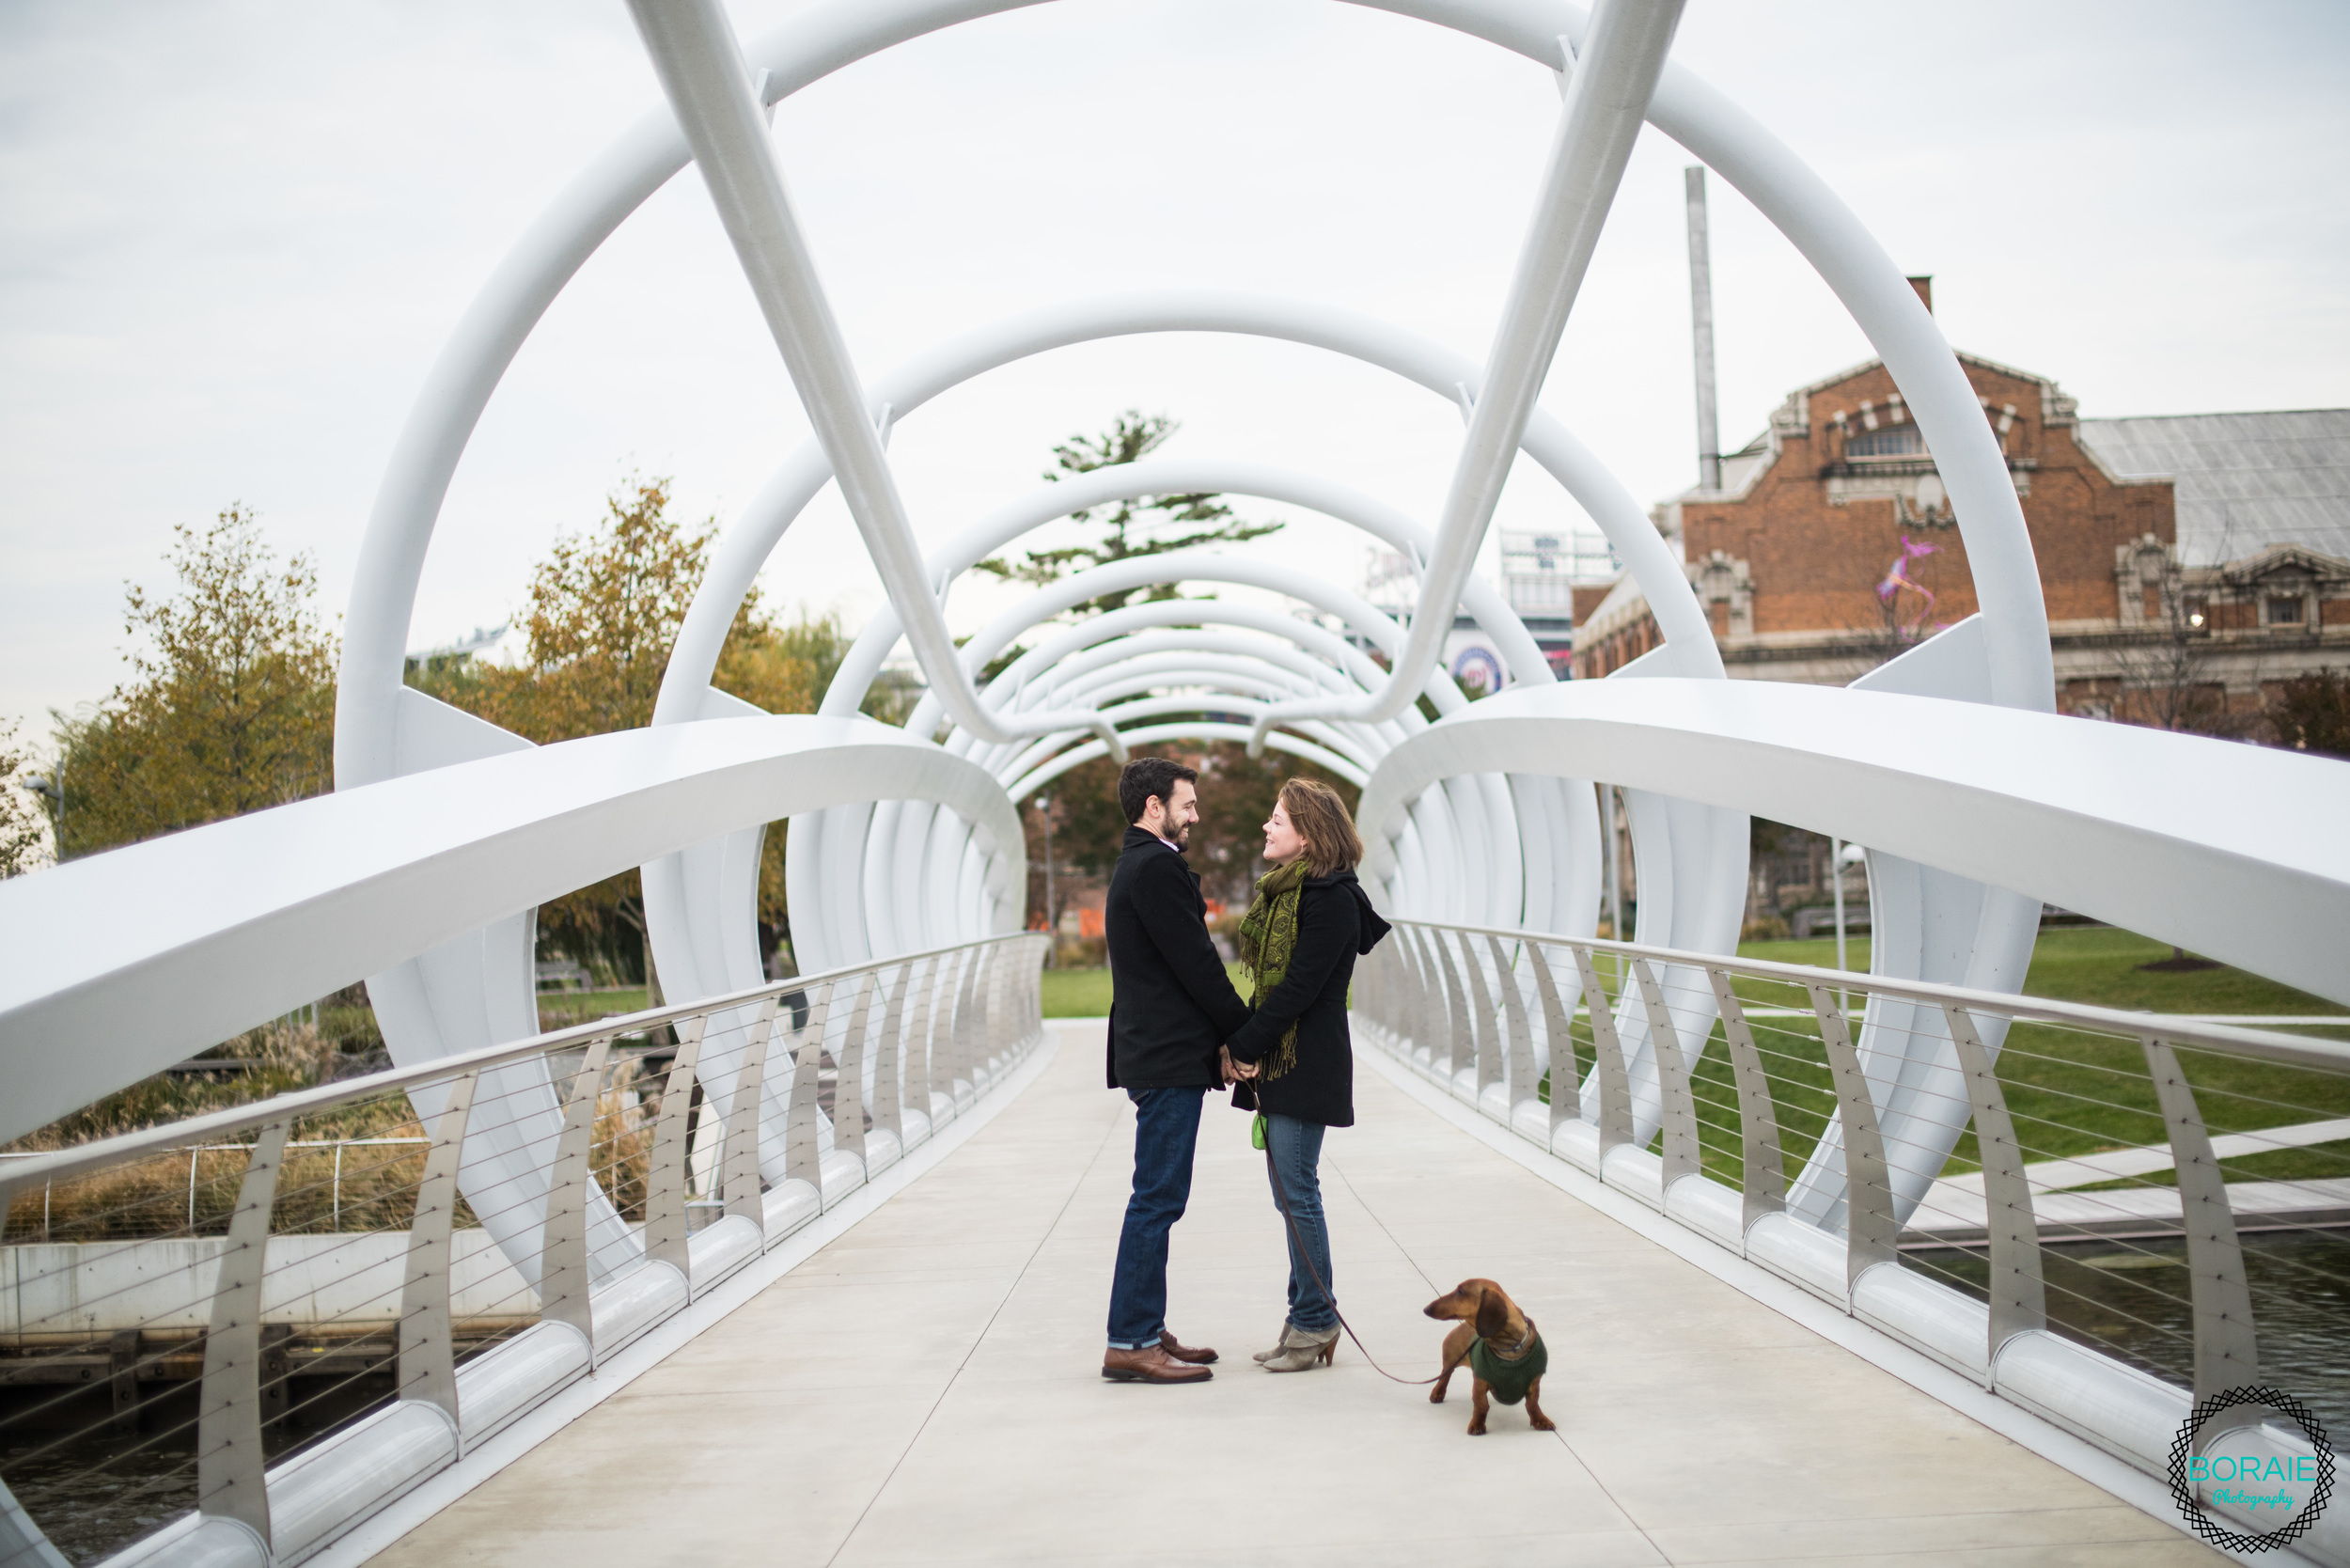 engagement session DC, Virginia and Maryland wedding photographer www.boraiephotography.com